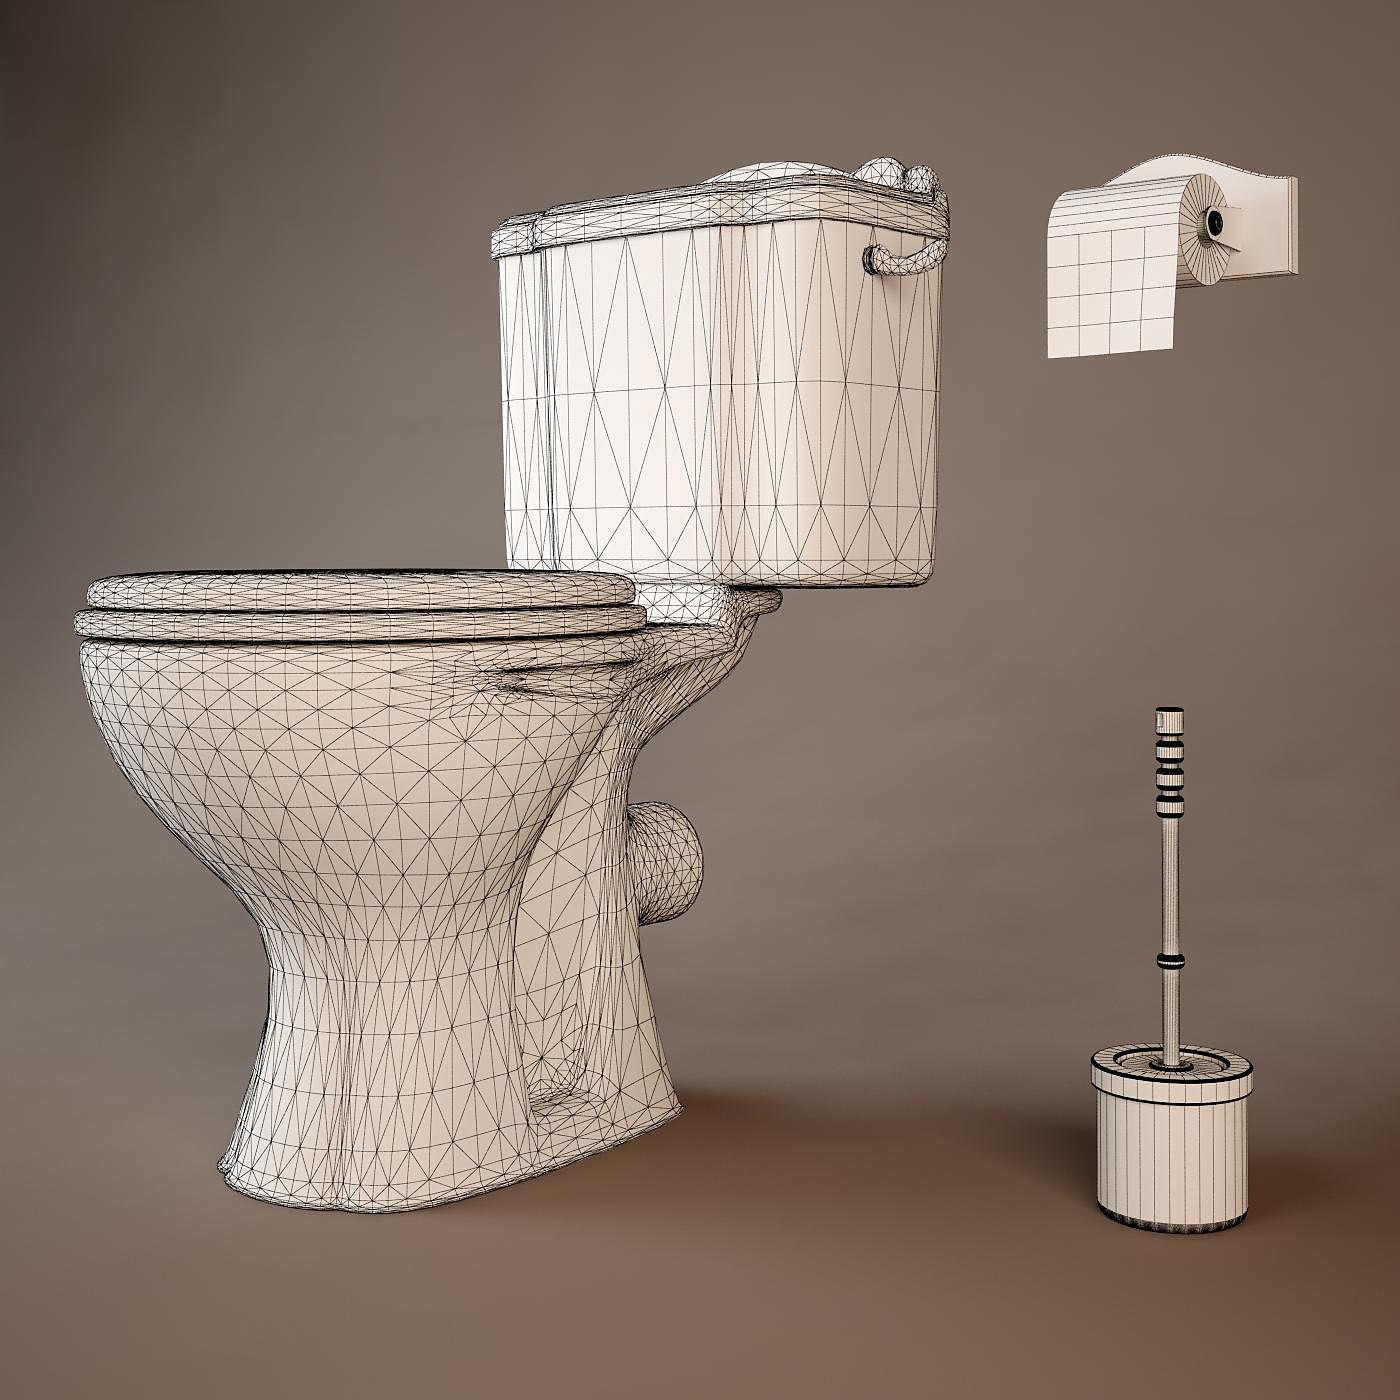 3D Salle De Bain Toilet | CGTrader